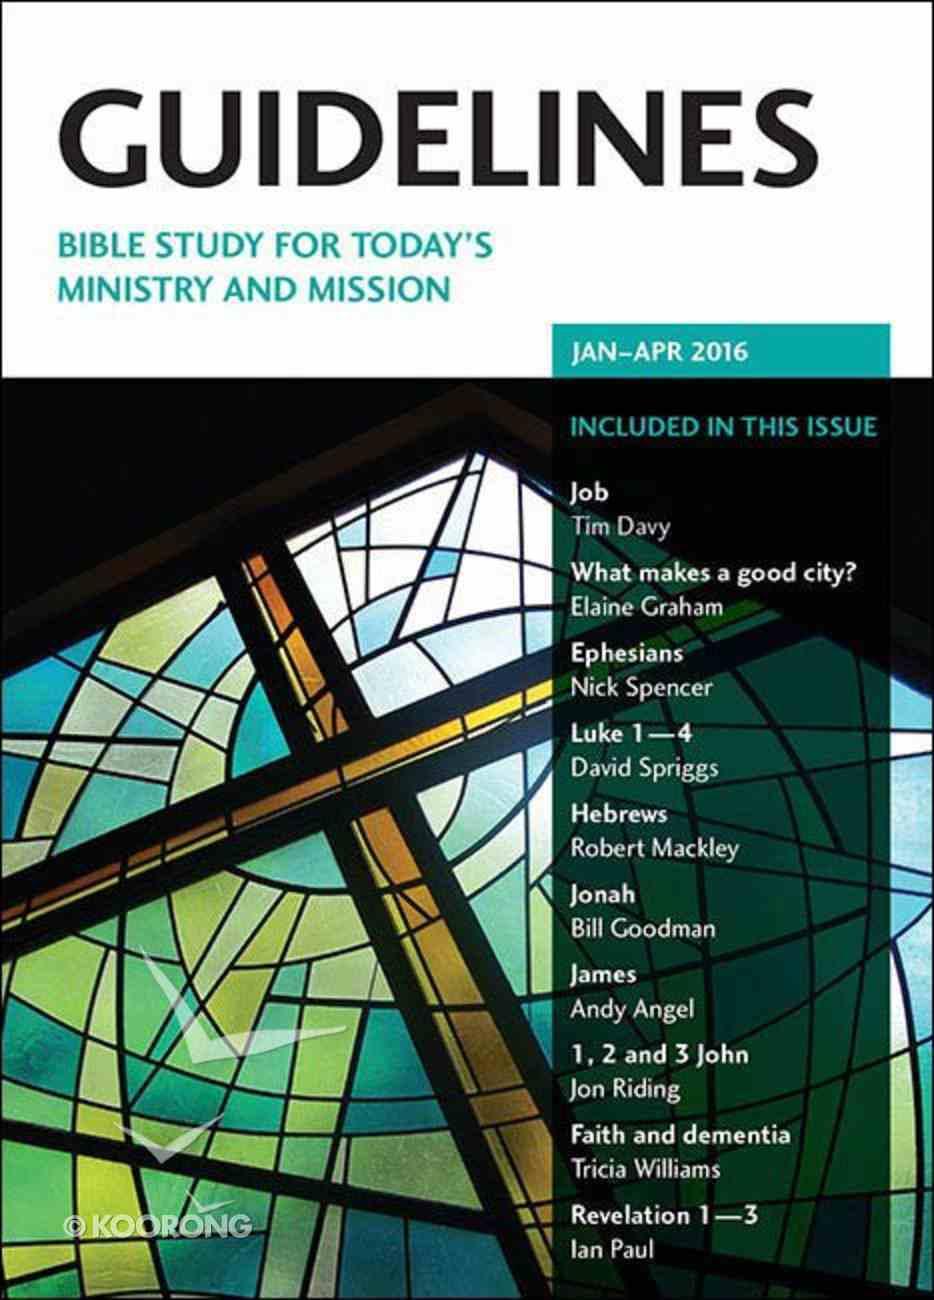 Guidelines 2016 #01: Jan-Apr Paperback